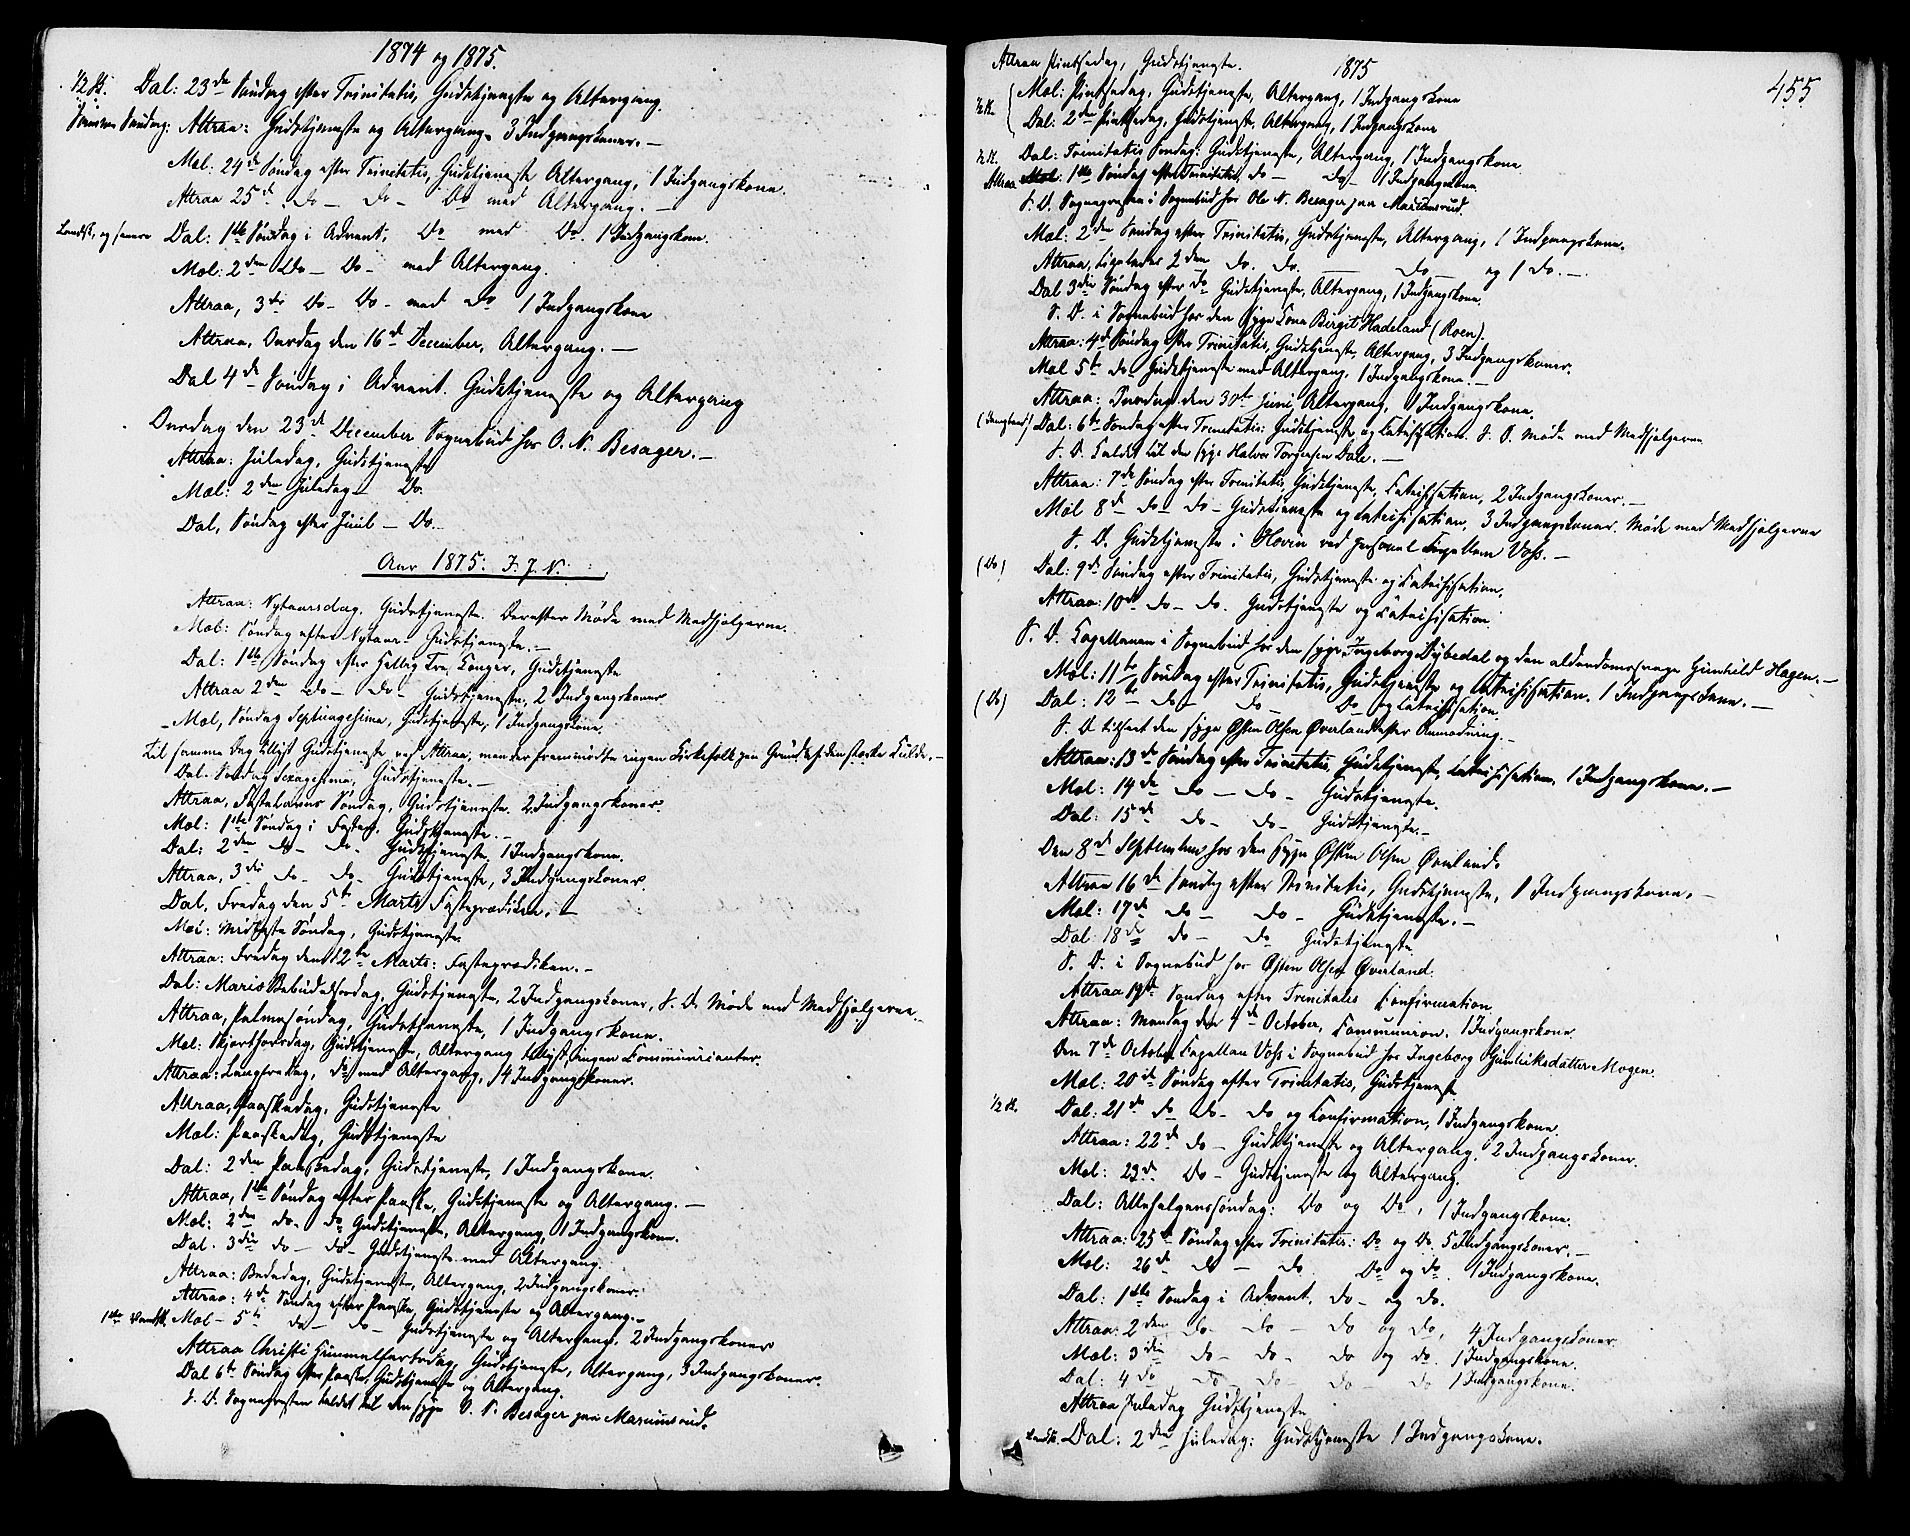 SAKO, Tinn kirkebøker, F/Fa/L0006: Ministerialbok nr. I 6, 1857-1878, s. 455